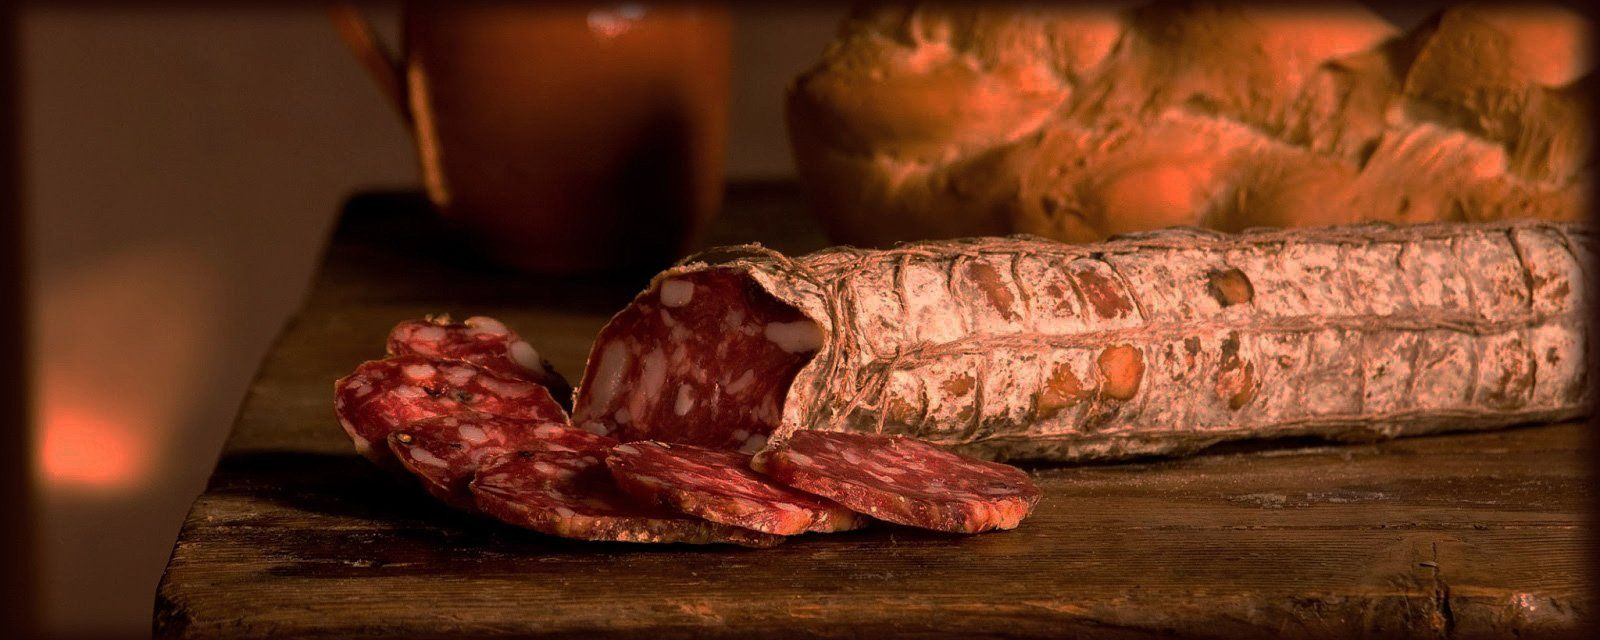 Siclian cold meats